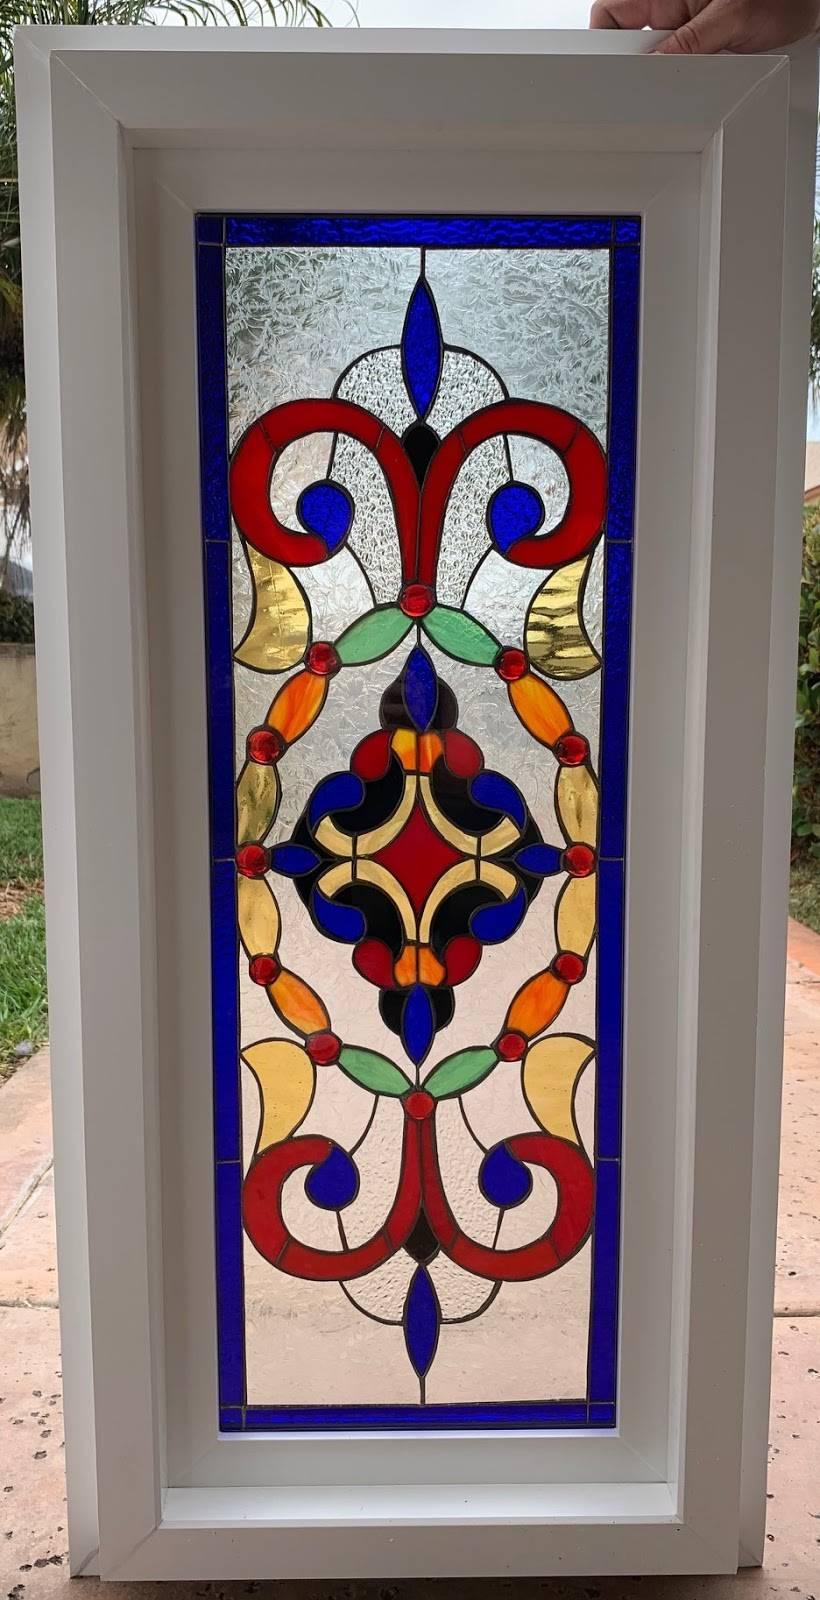 Birmingham Art Glass Inc - store  | Photo 3 of 9 | Address: 107 Ave U, Birmingham, AL 35214, USA | Phone: (205) 798-1081